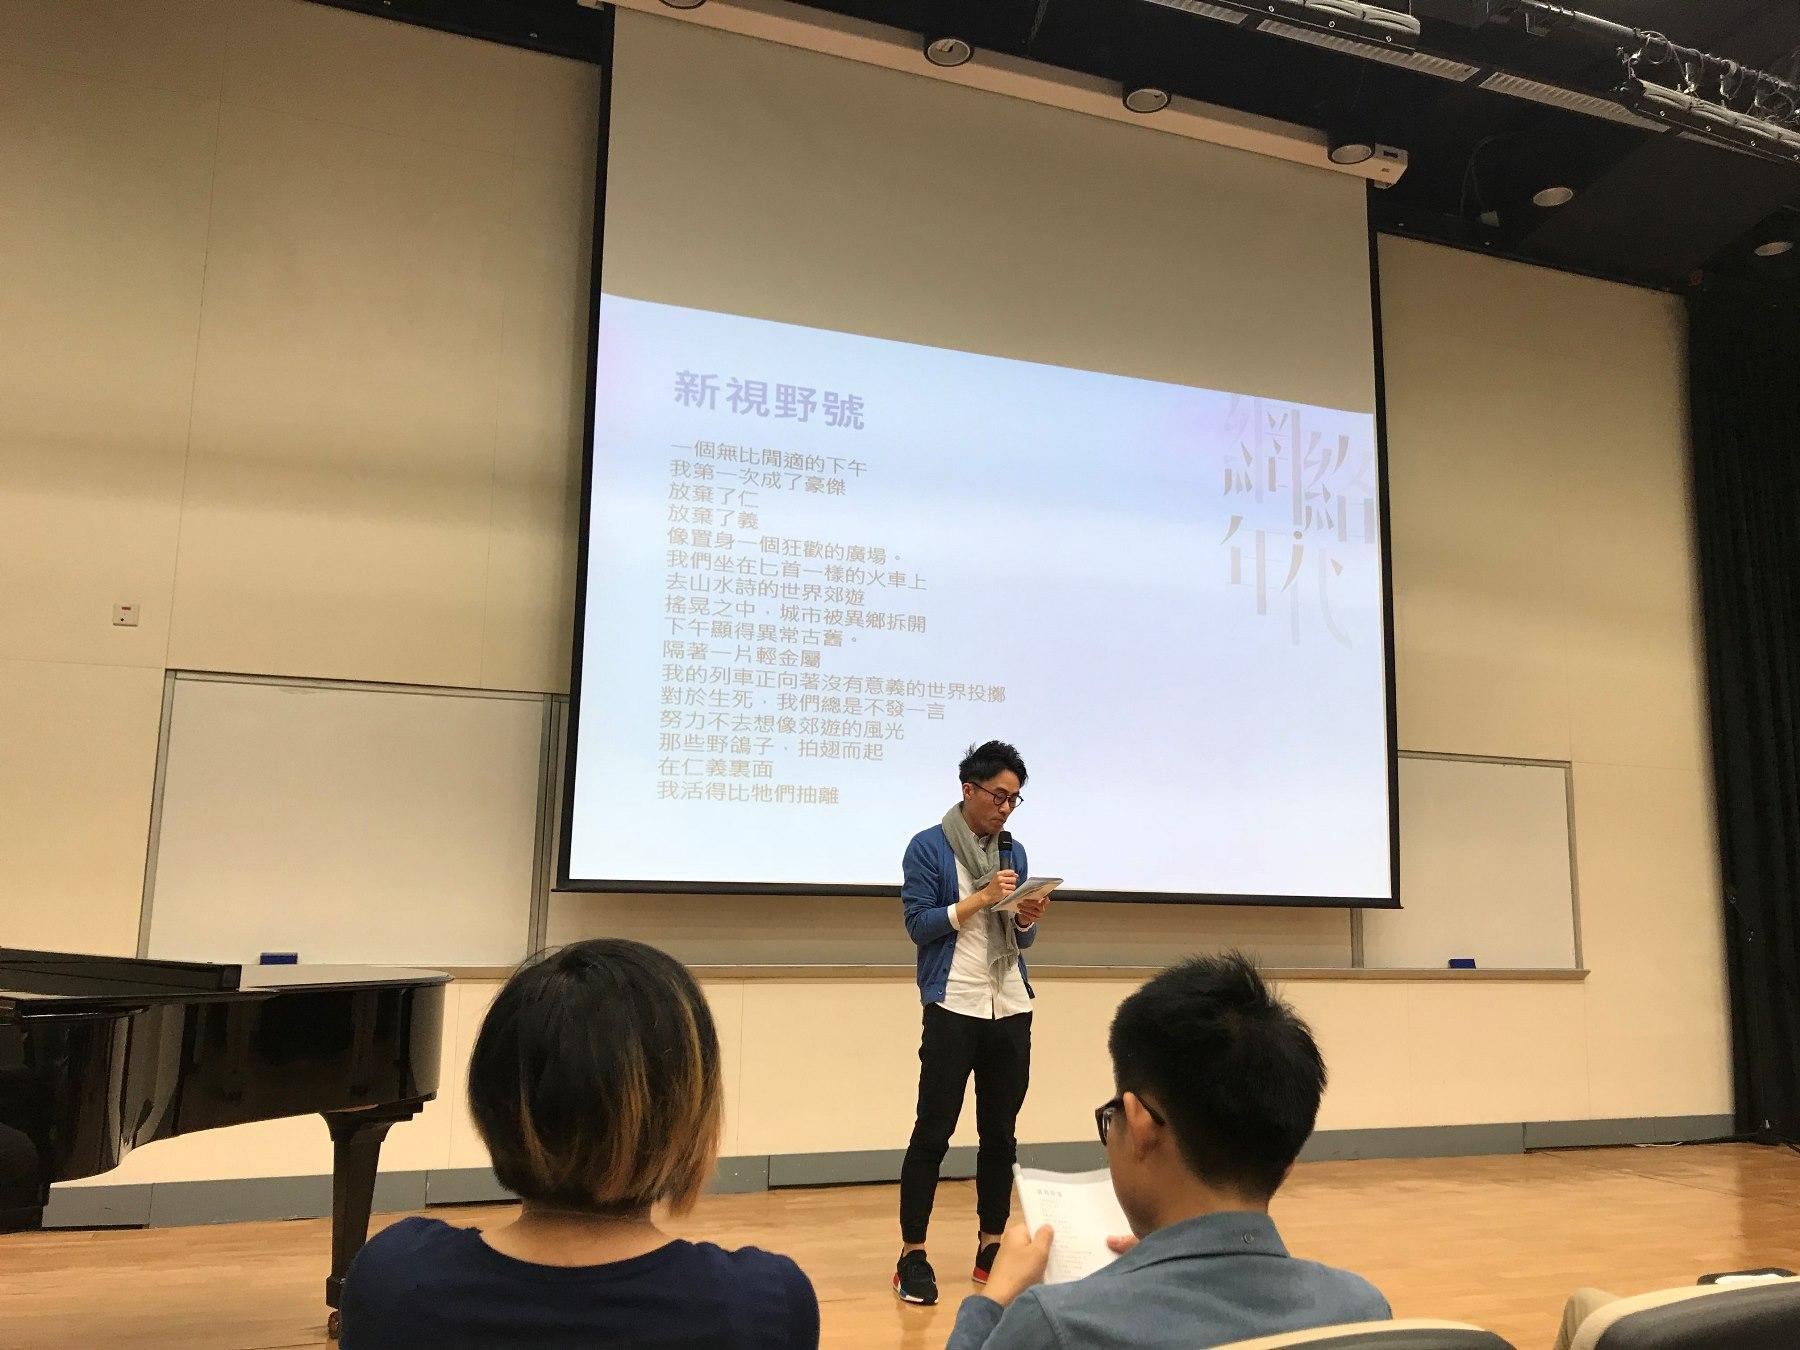 http://npc.edu.hk/sites/default/files/img_6193.jpeg